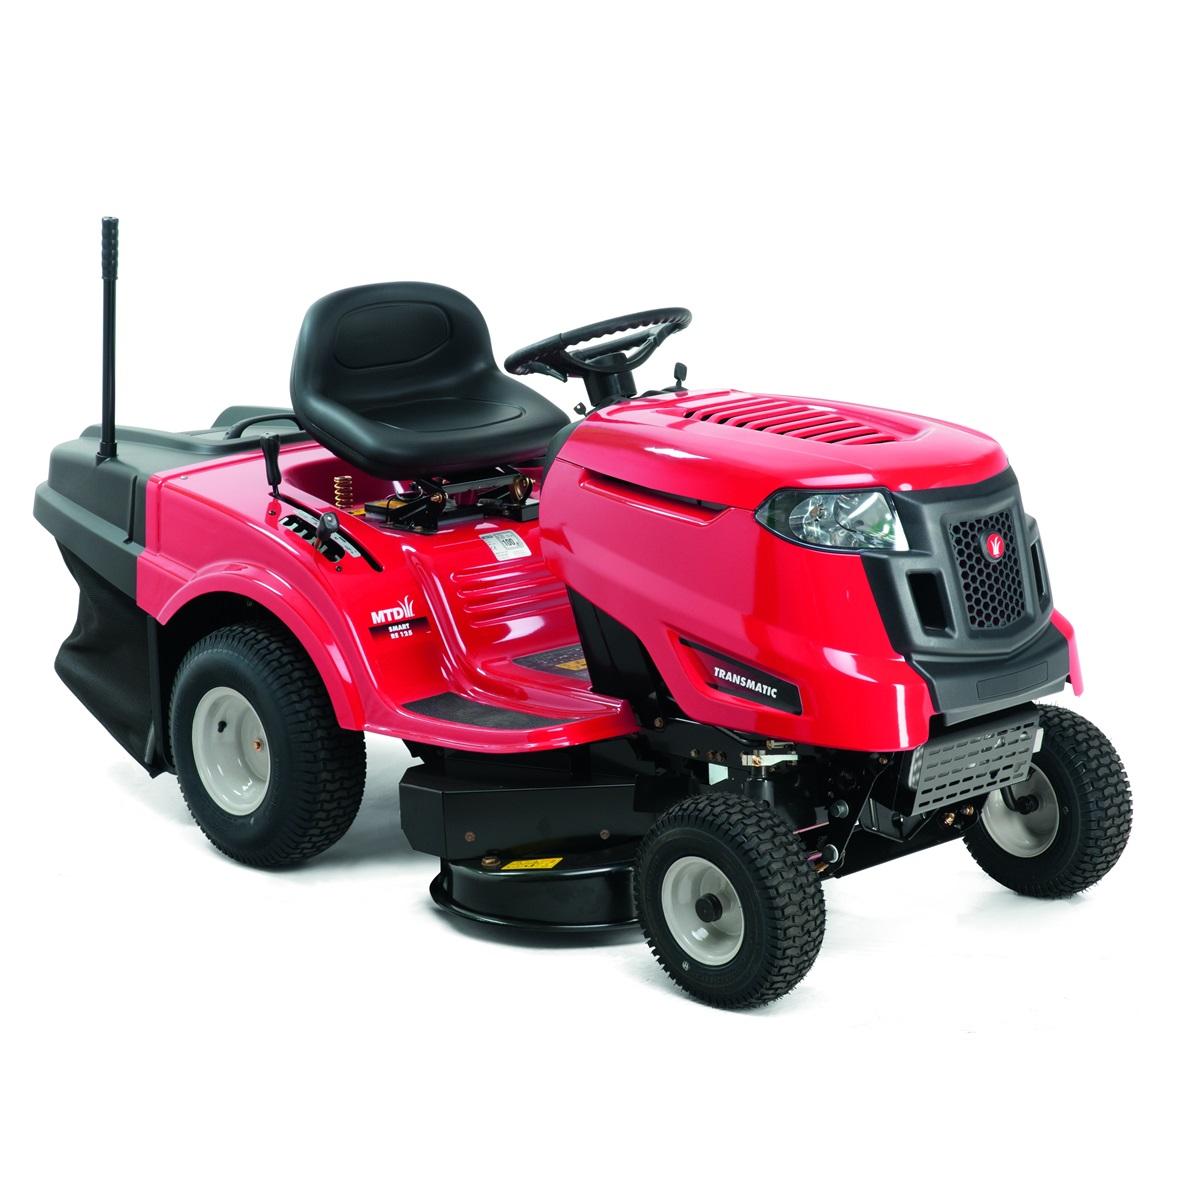 MTD SMART RE 125 zahradní traktor + servis EXTRA